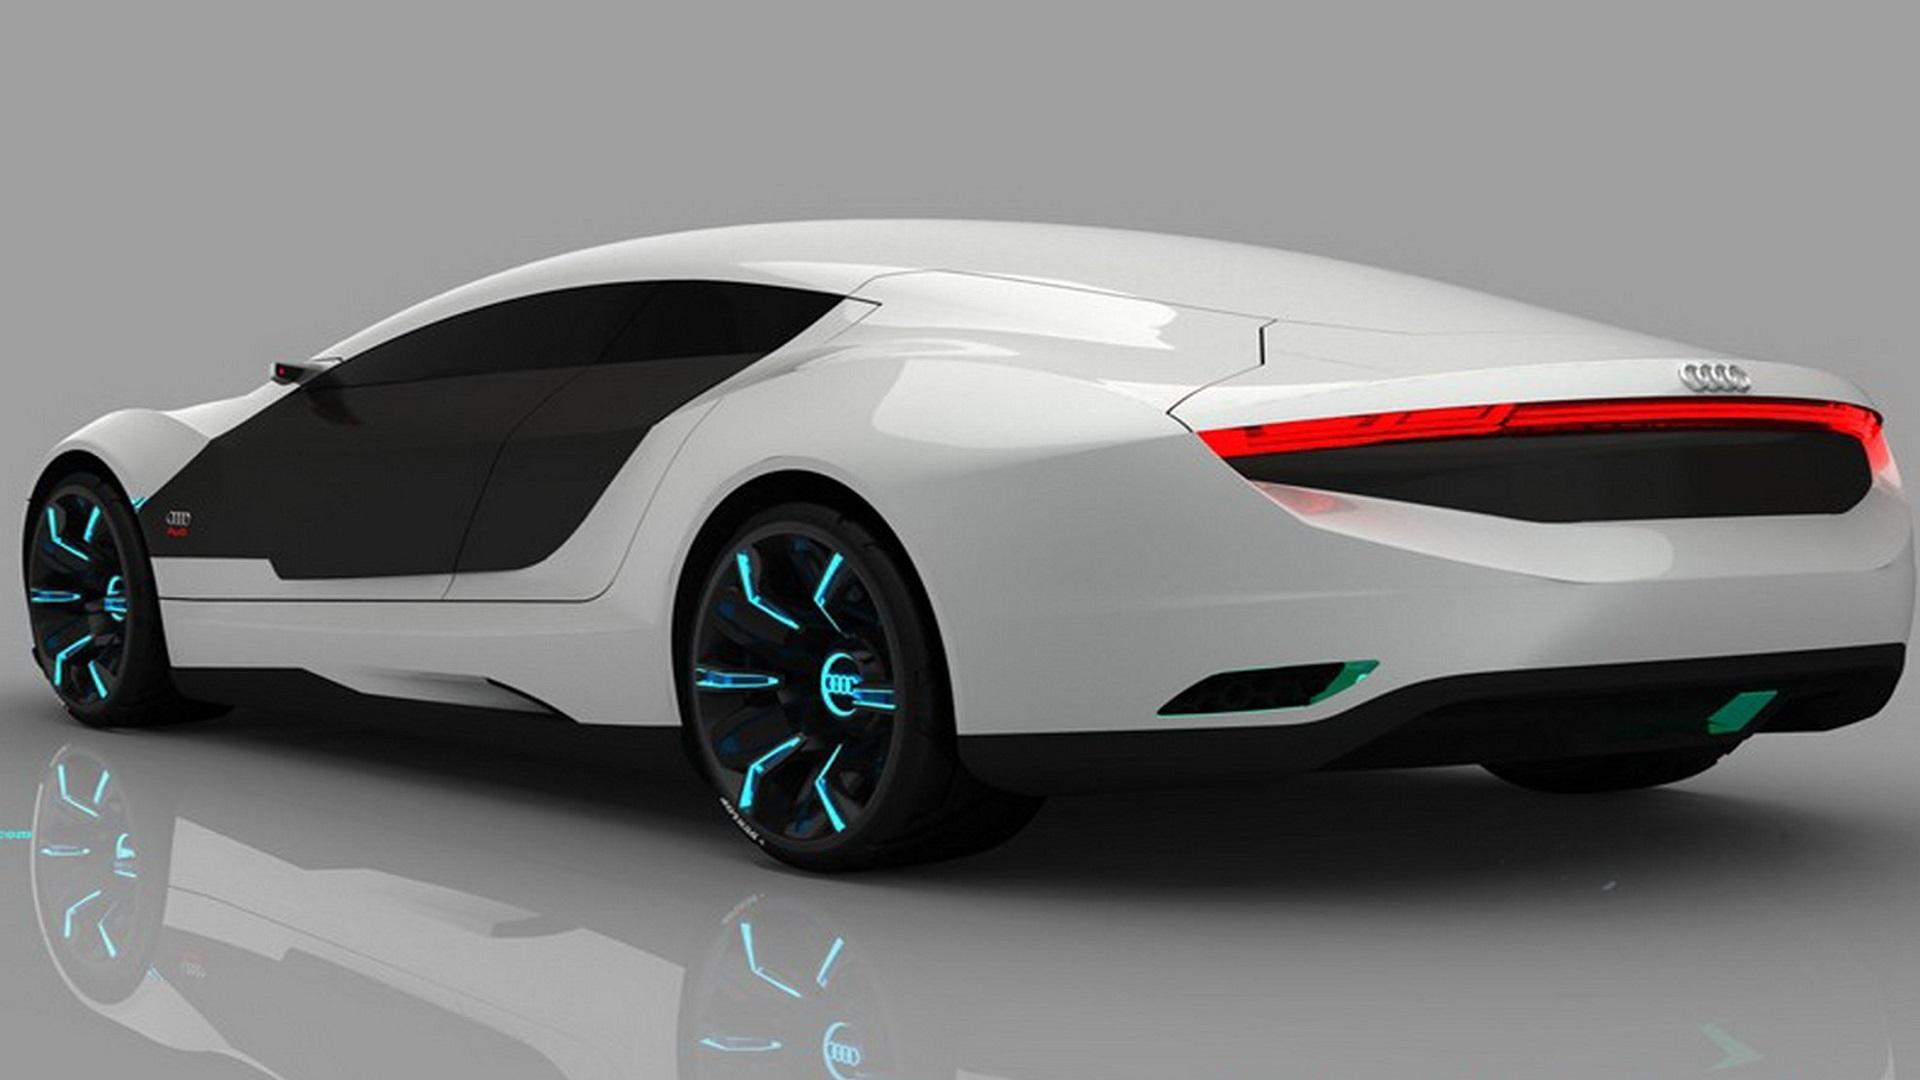 Audi Vehicles 2015 5 Background Wallpaper Car Hd Wallpaper